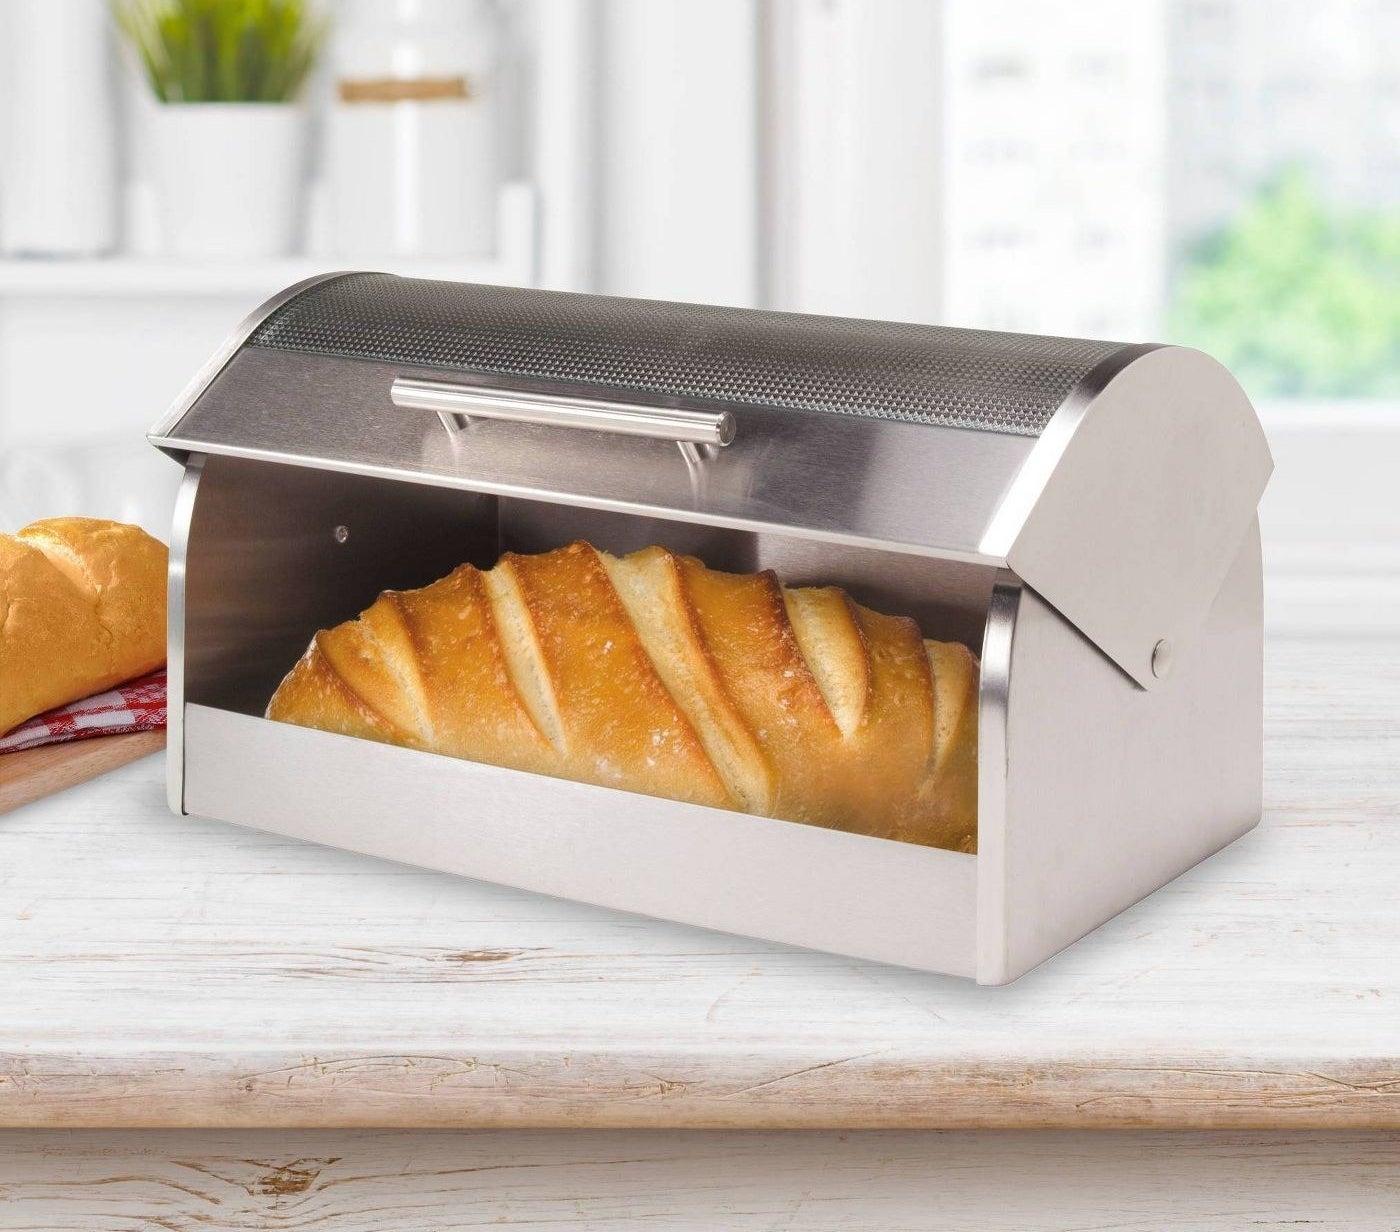 Stainless steel breadbox